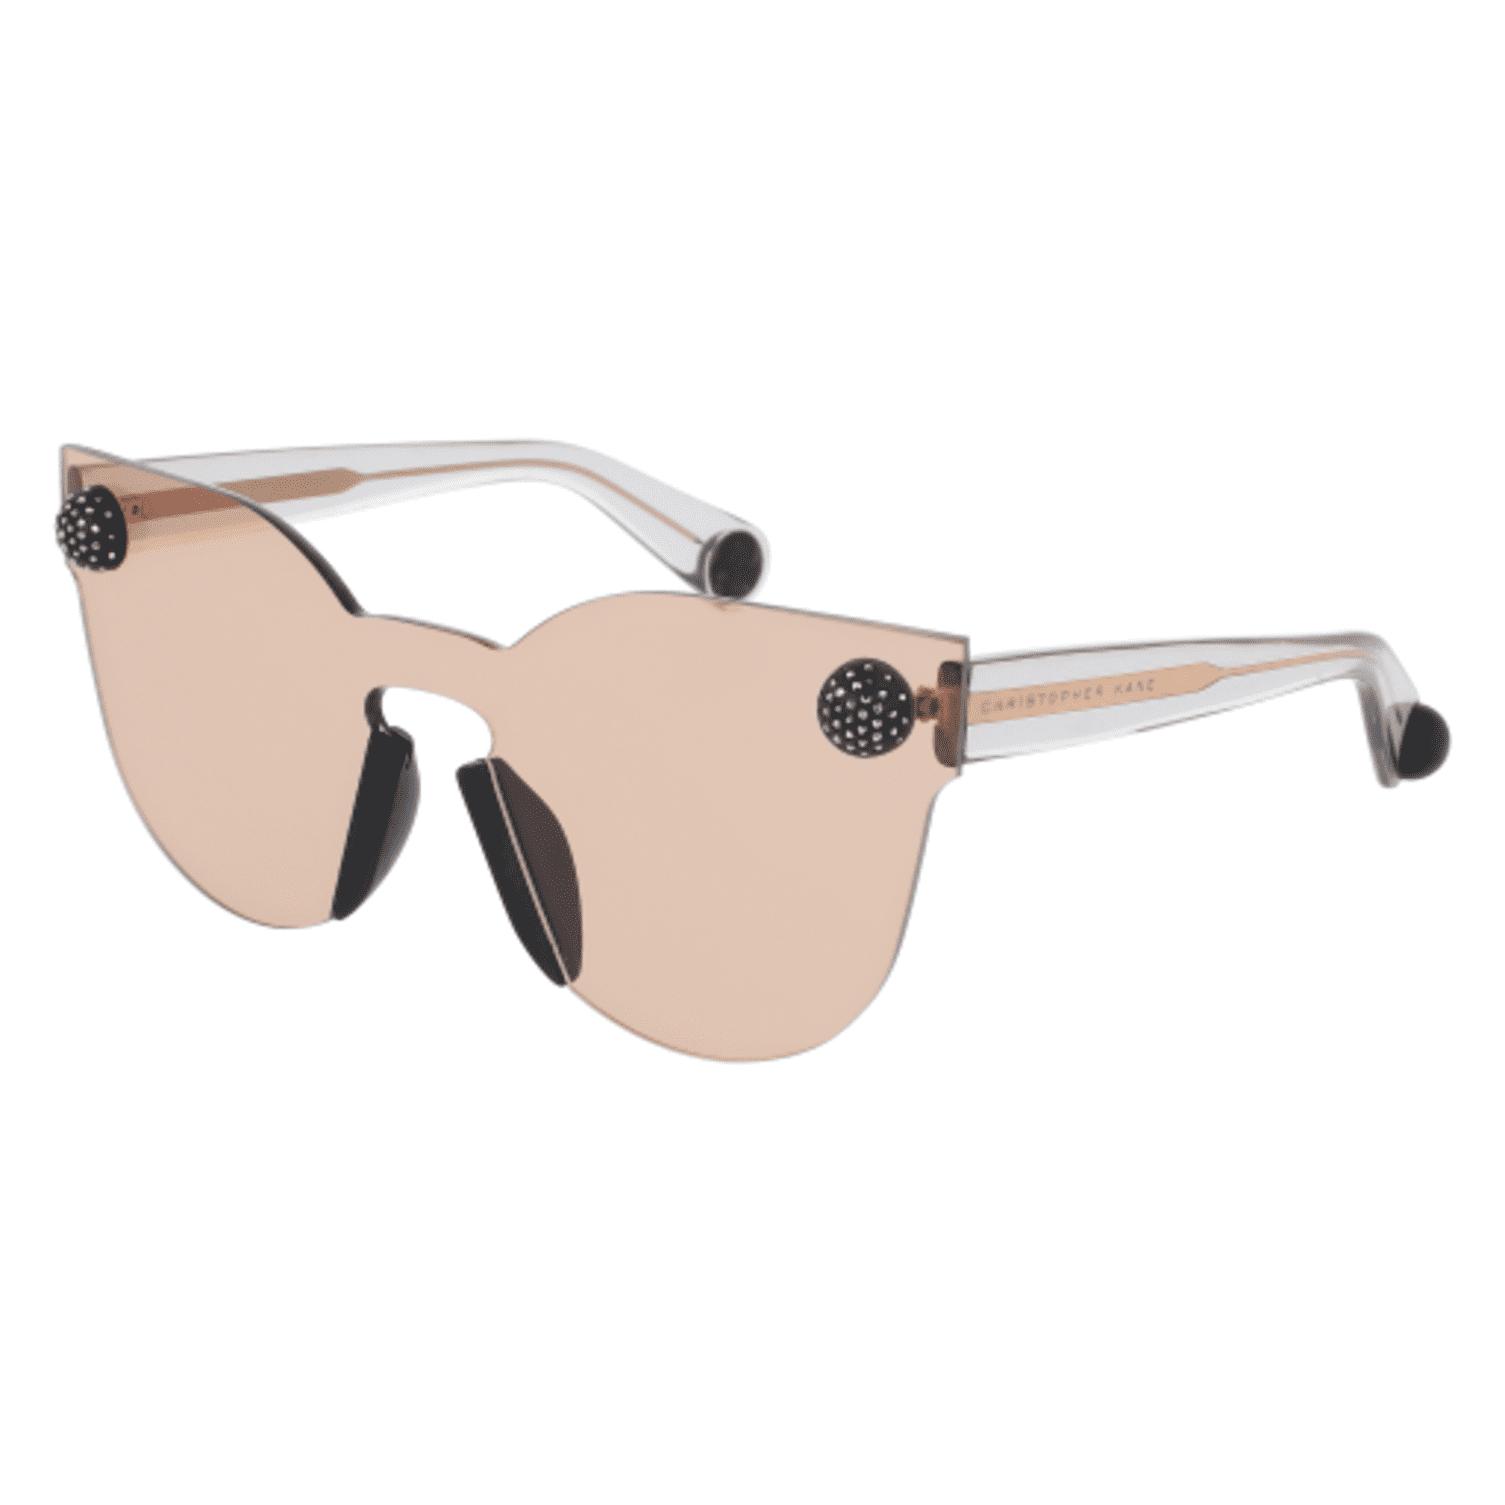 Sunglasses Christopher Kane CK 0007 S- 002 PINK /